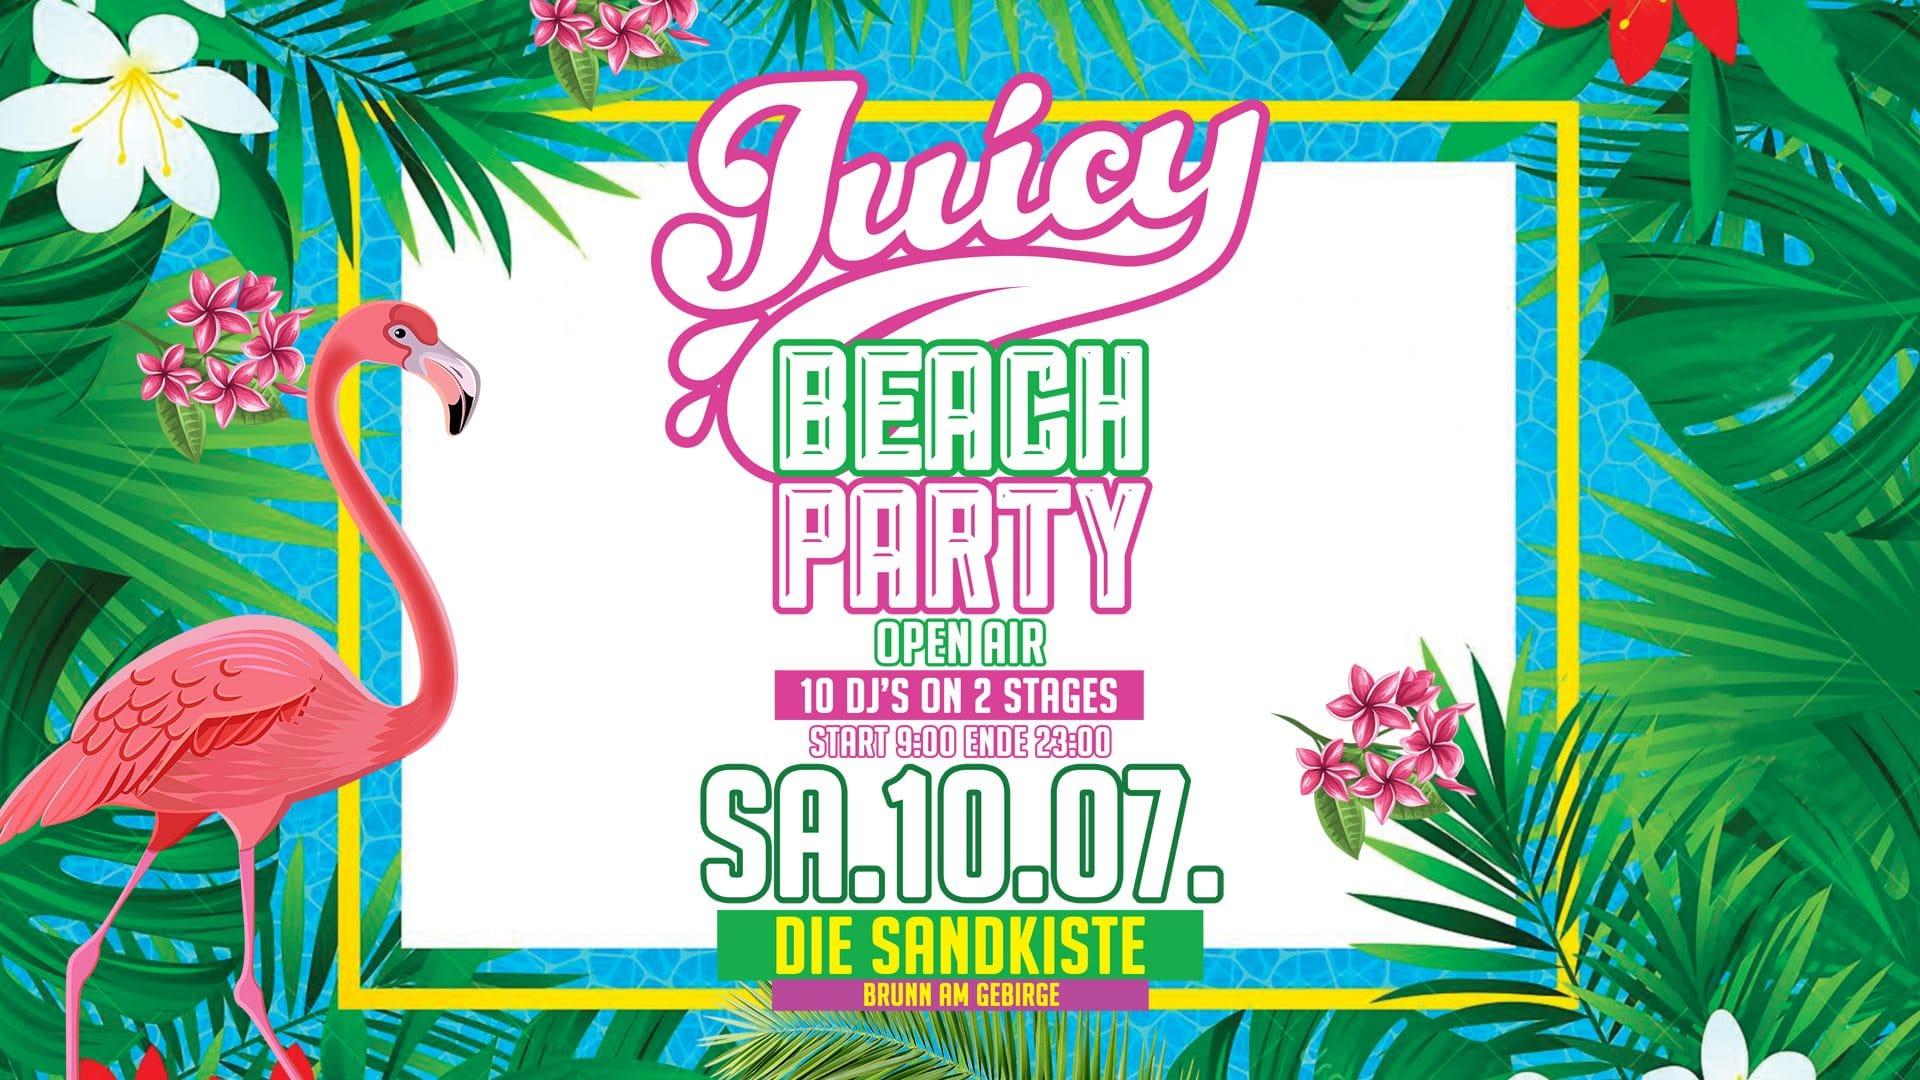 Events Wien: Juicy Beach Party – 10.07.2021 – Die Sandkiste